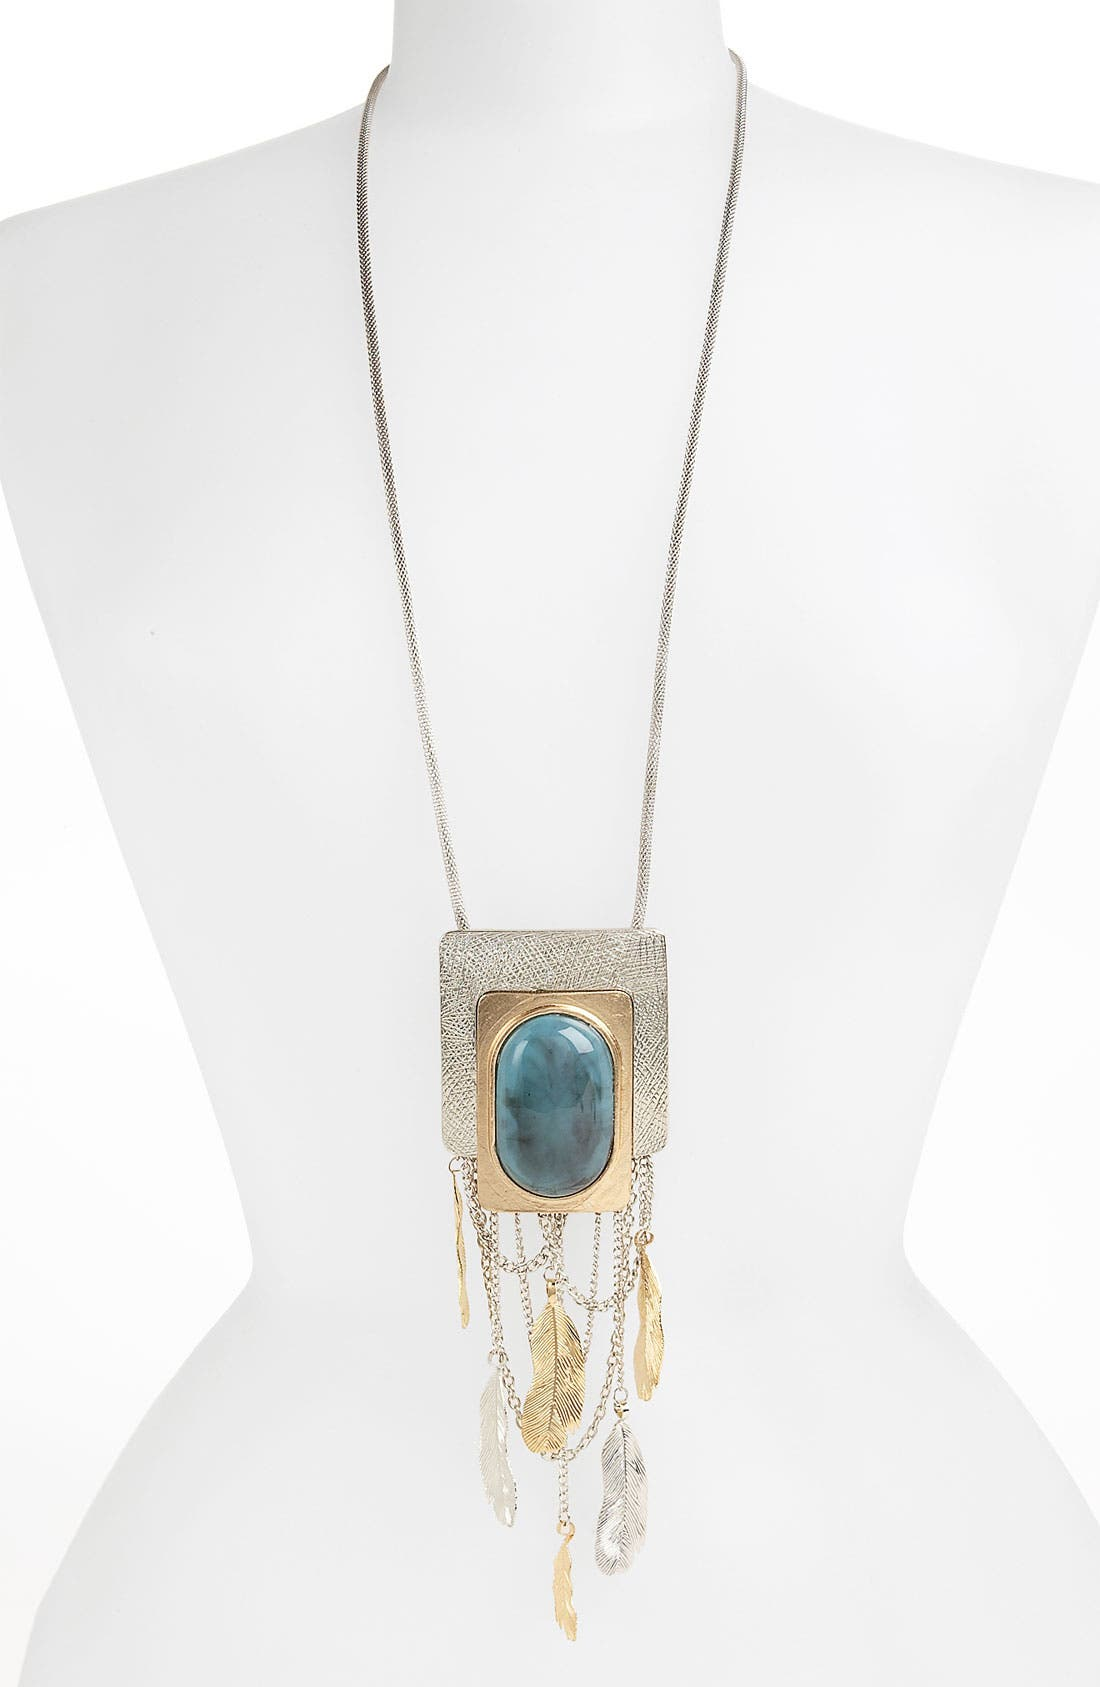 Main Image - Natasha Couture 'Deco Hippie' Pendant Necklace